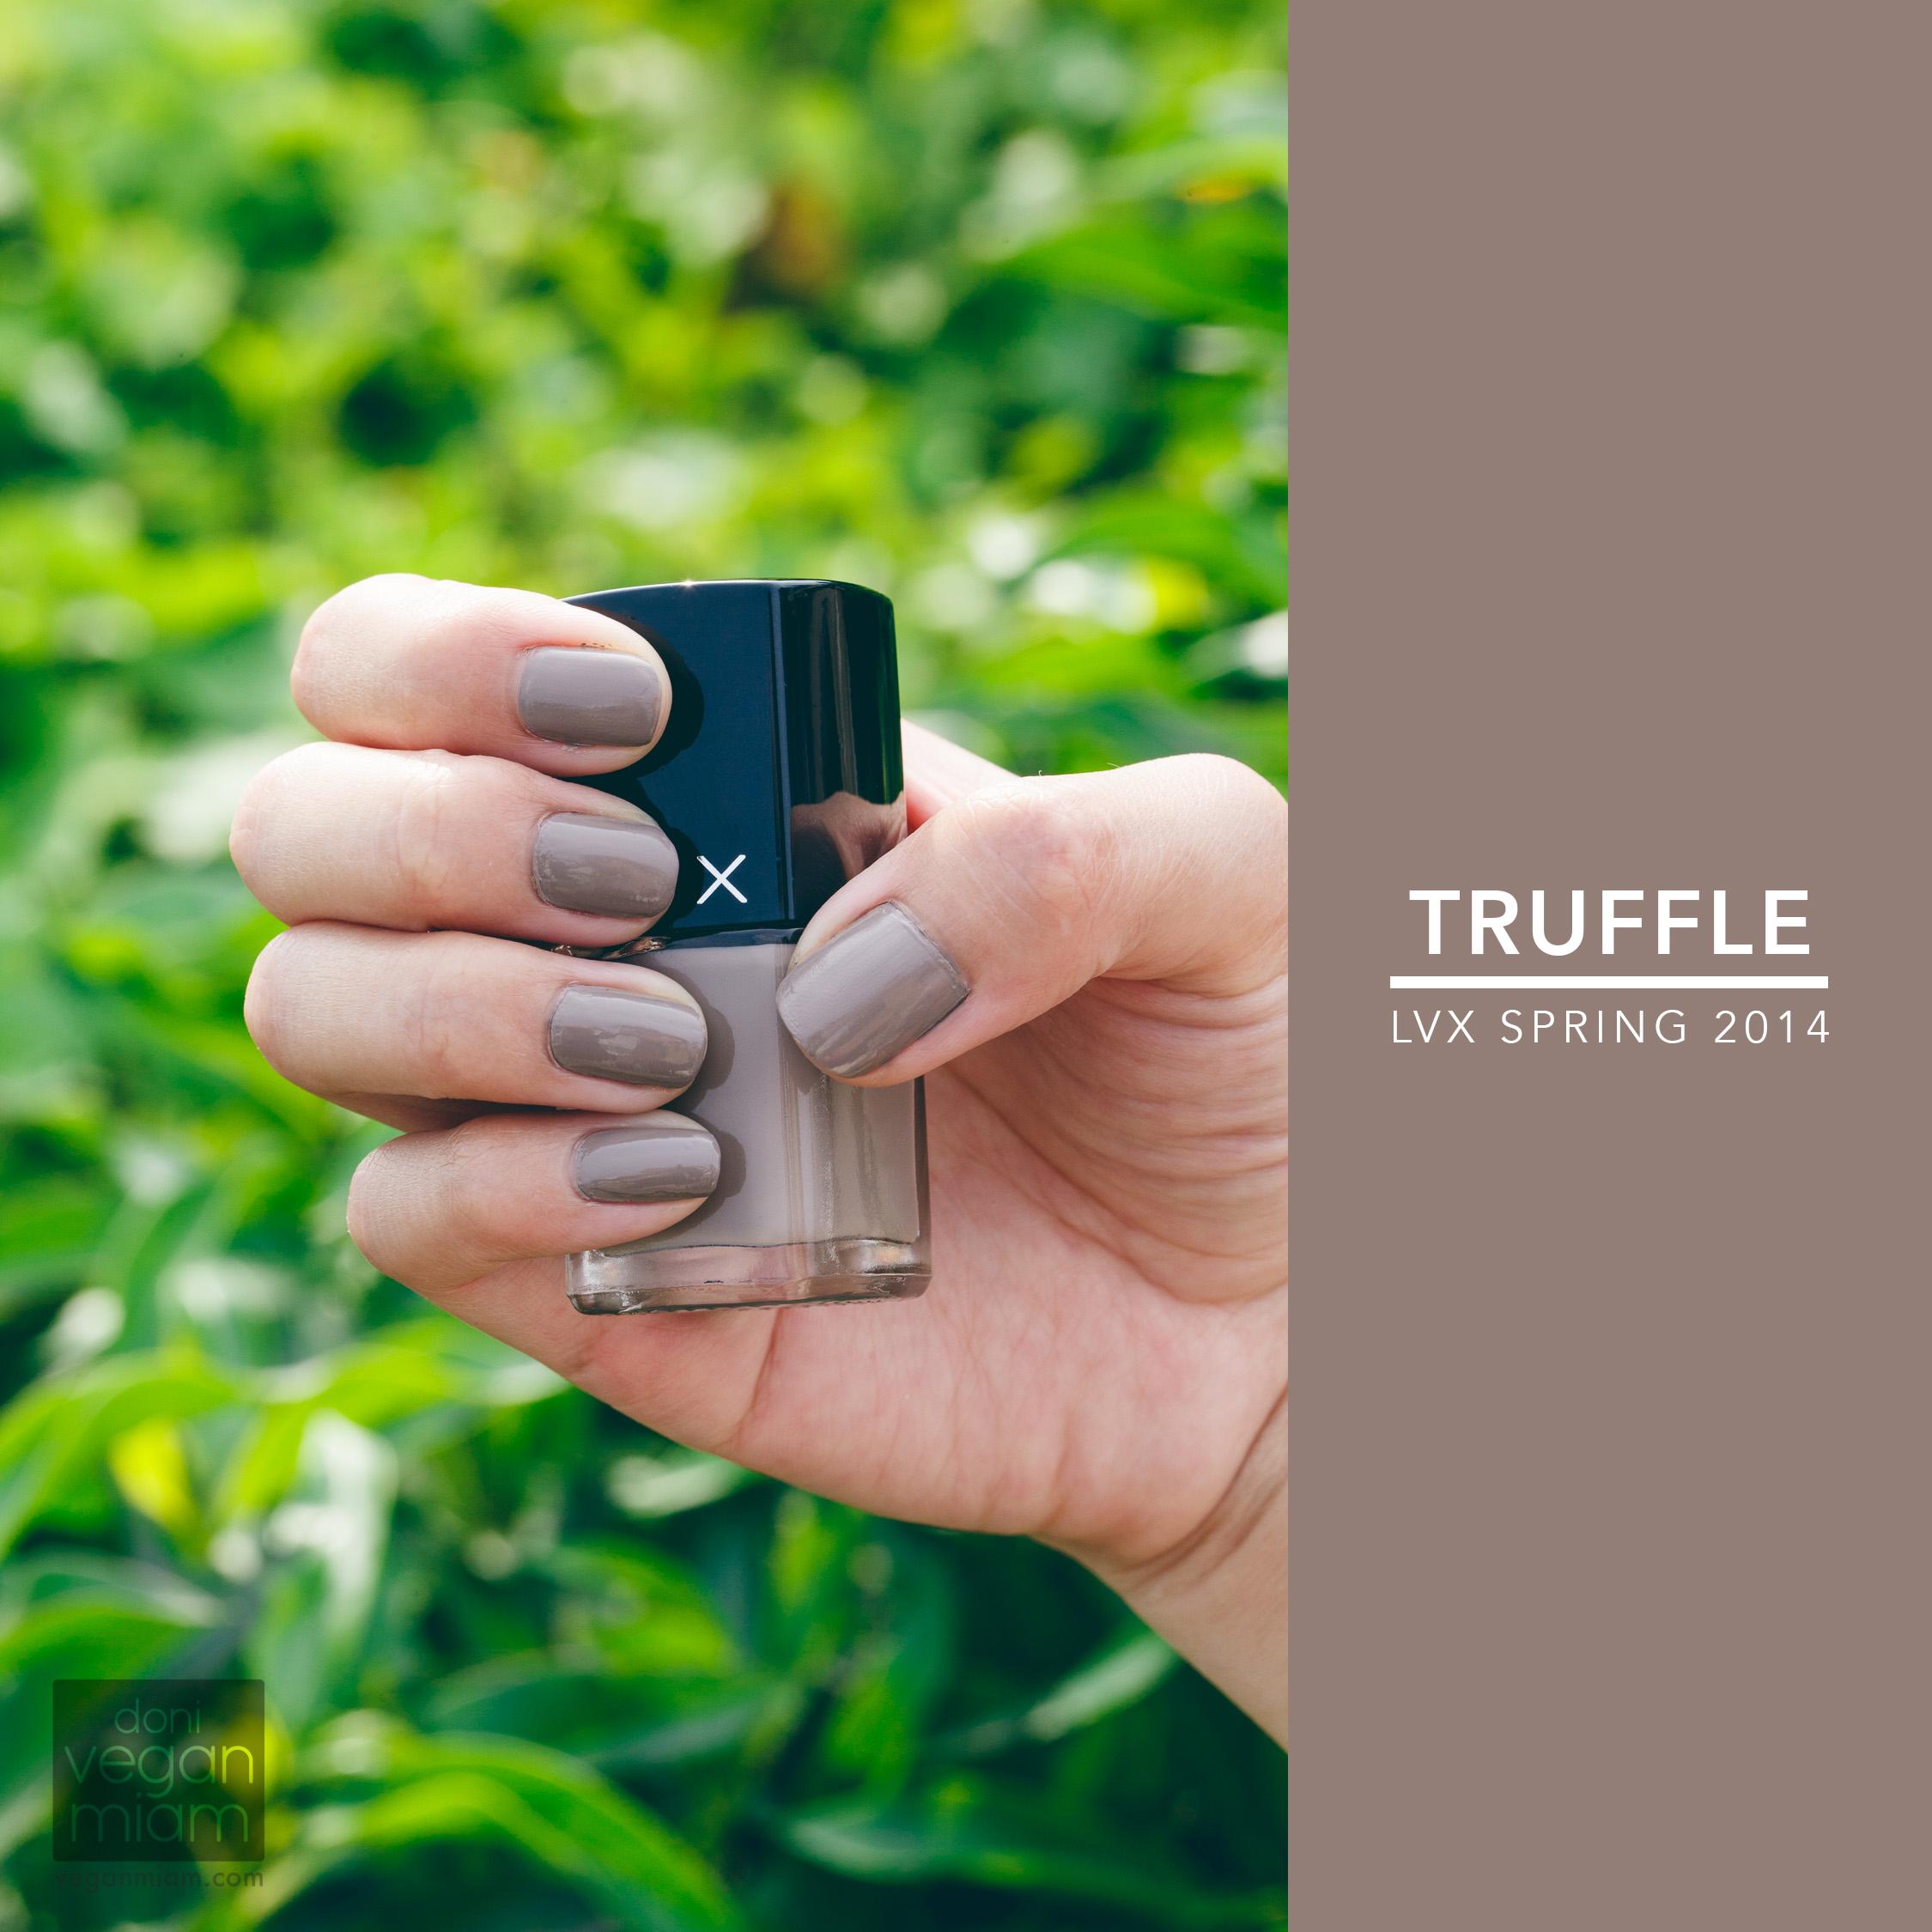 LVX Spring 2014 - Truffle